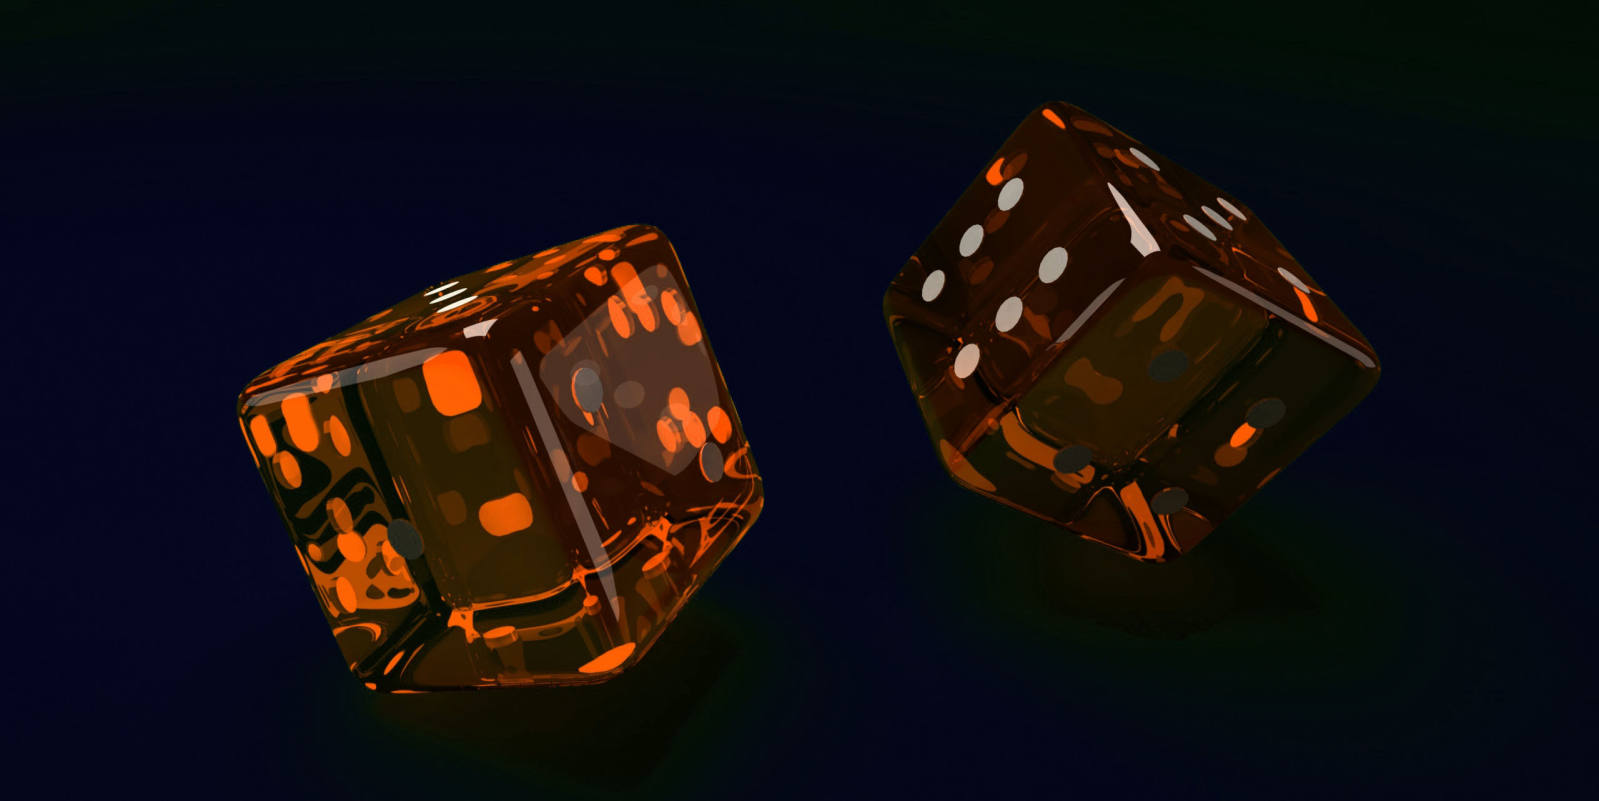 dice-2.jpg